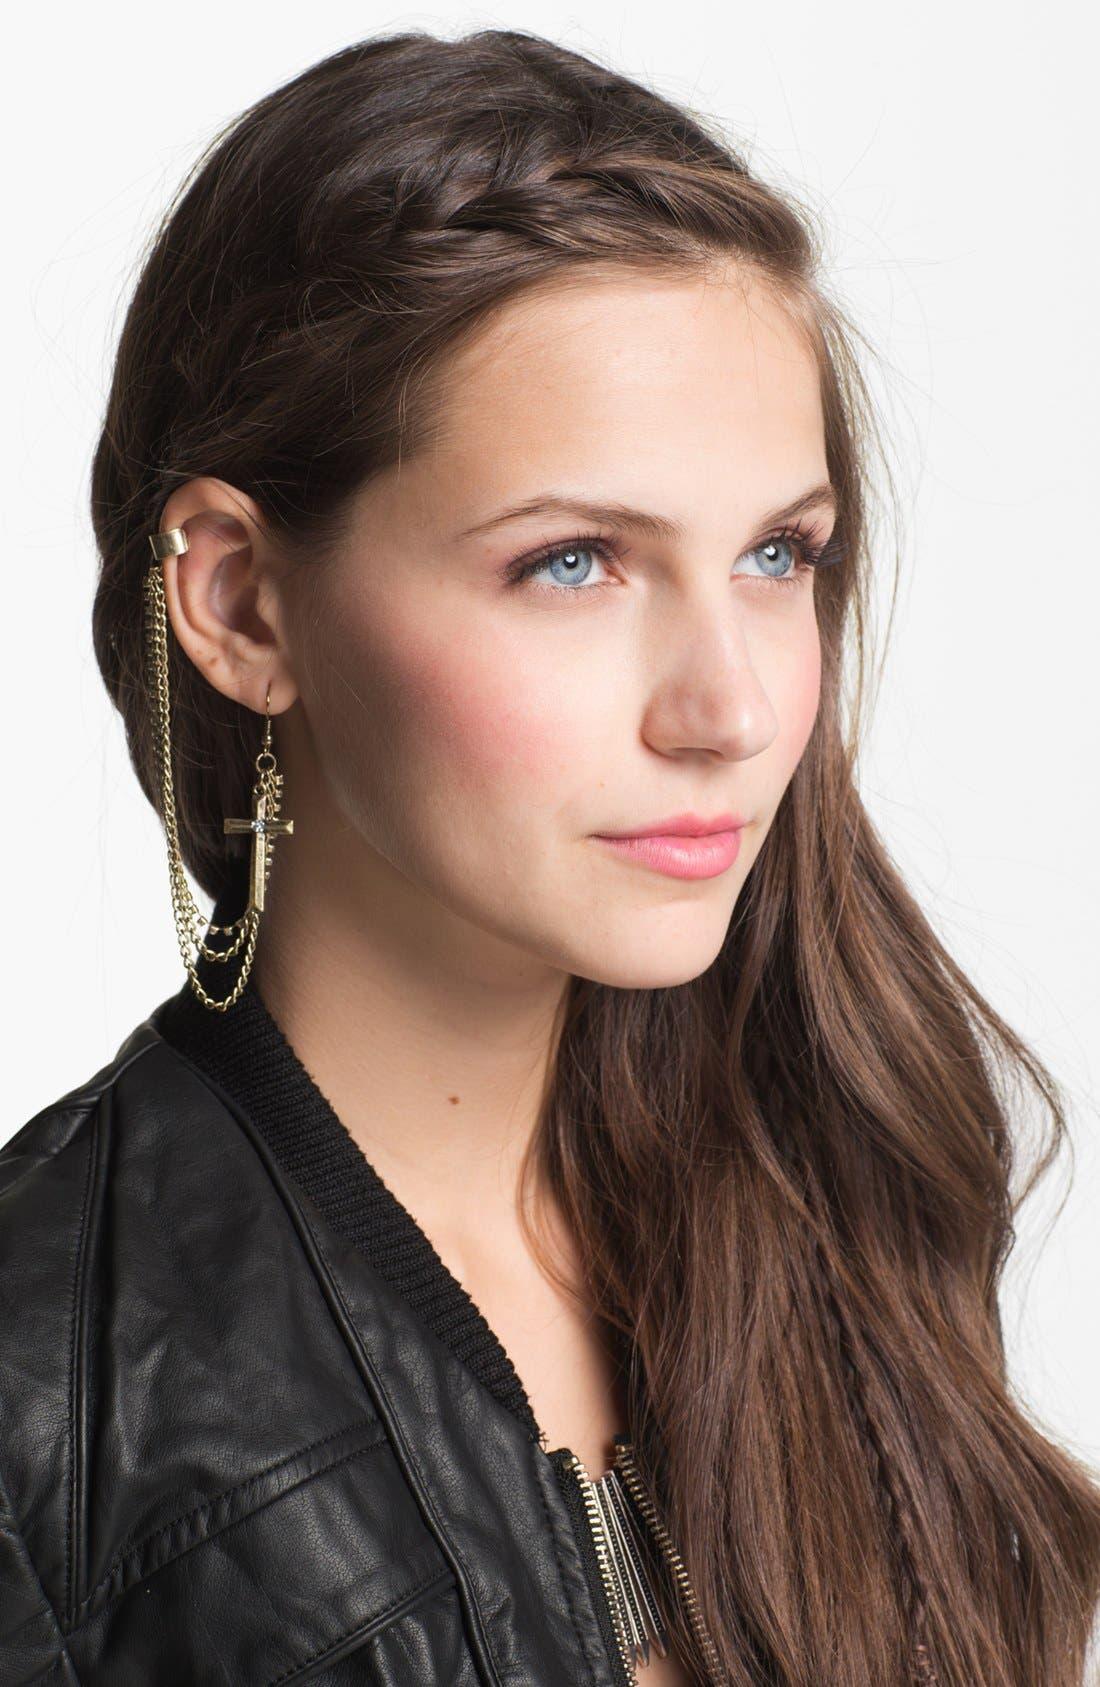 Alternate Image 1 Selected - BP. Cross Chain Ear Cuff